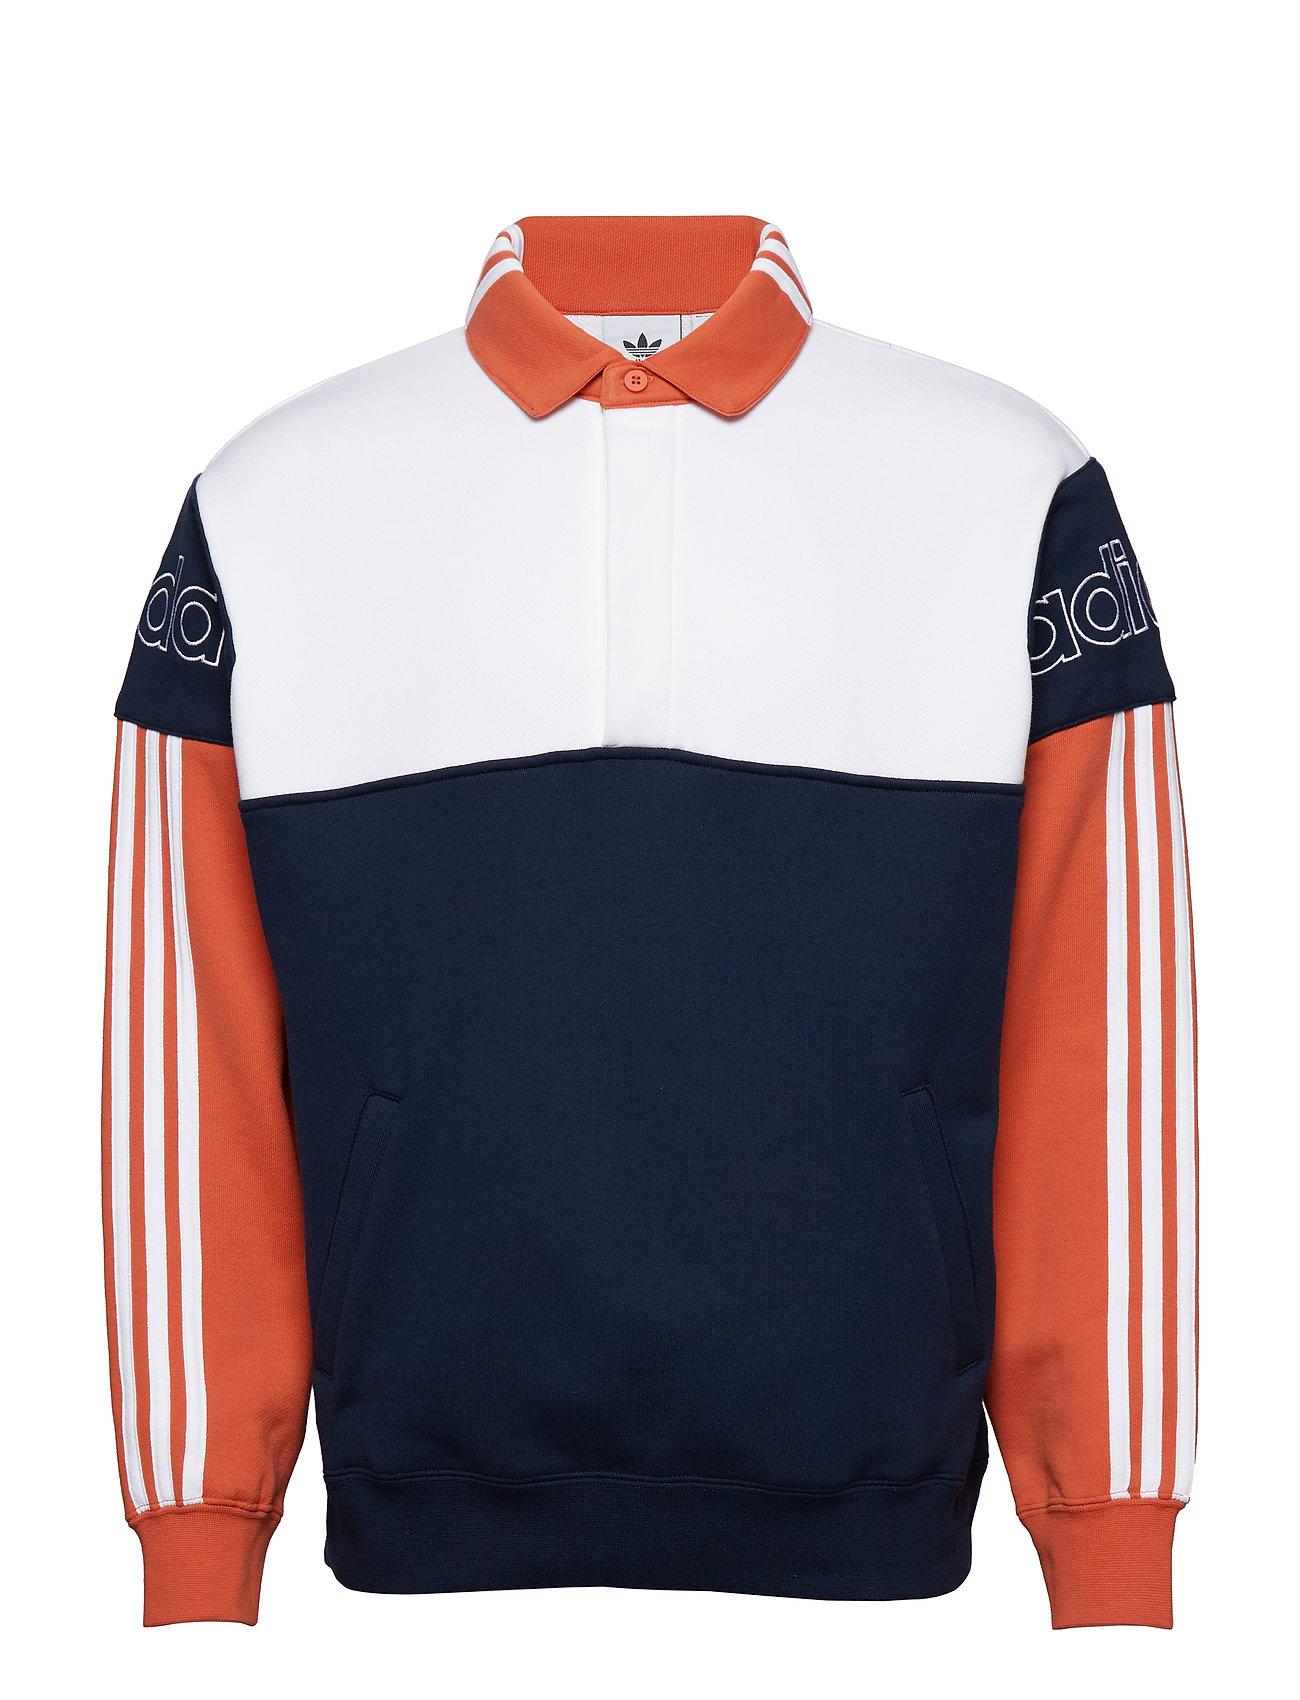 Adidas Originals RUGBY SWEAT Ögrönlar